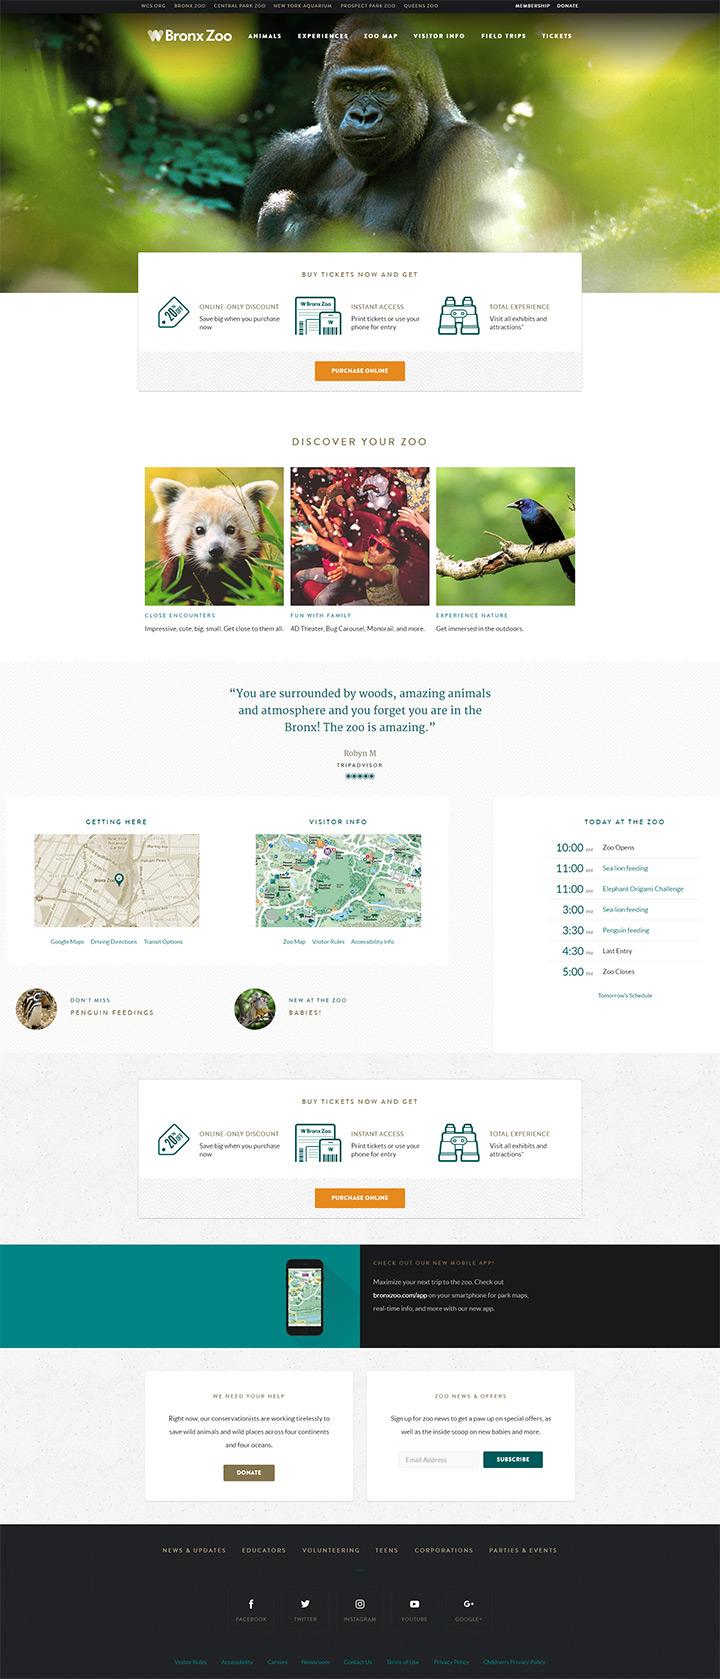 bronx zoo website